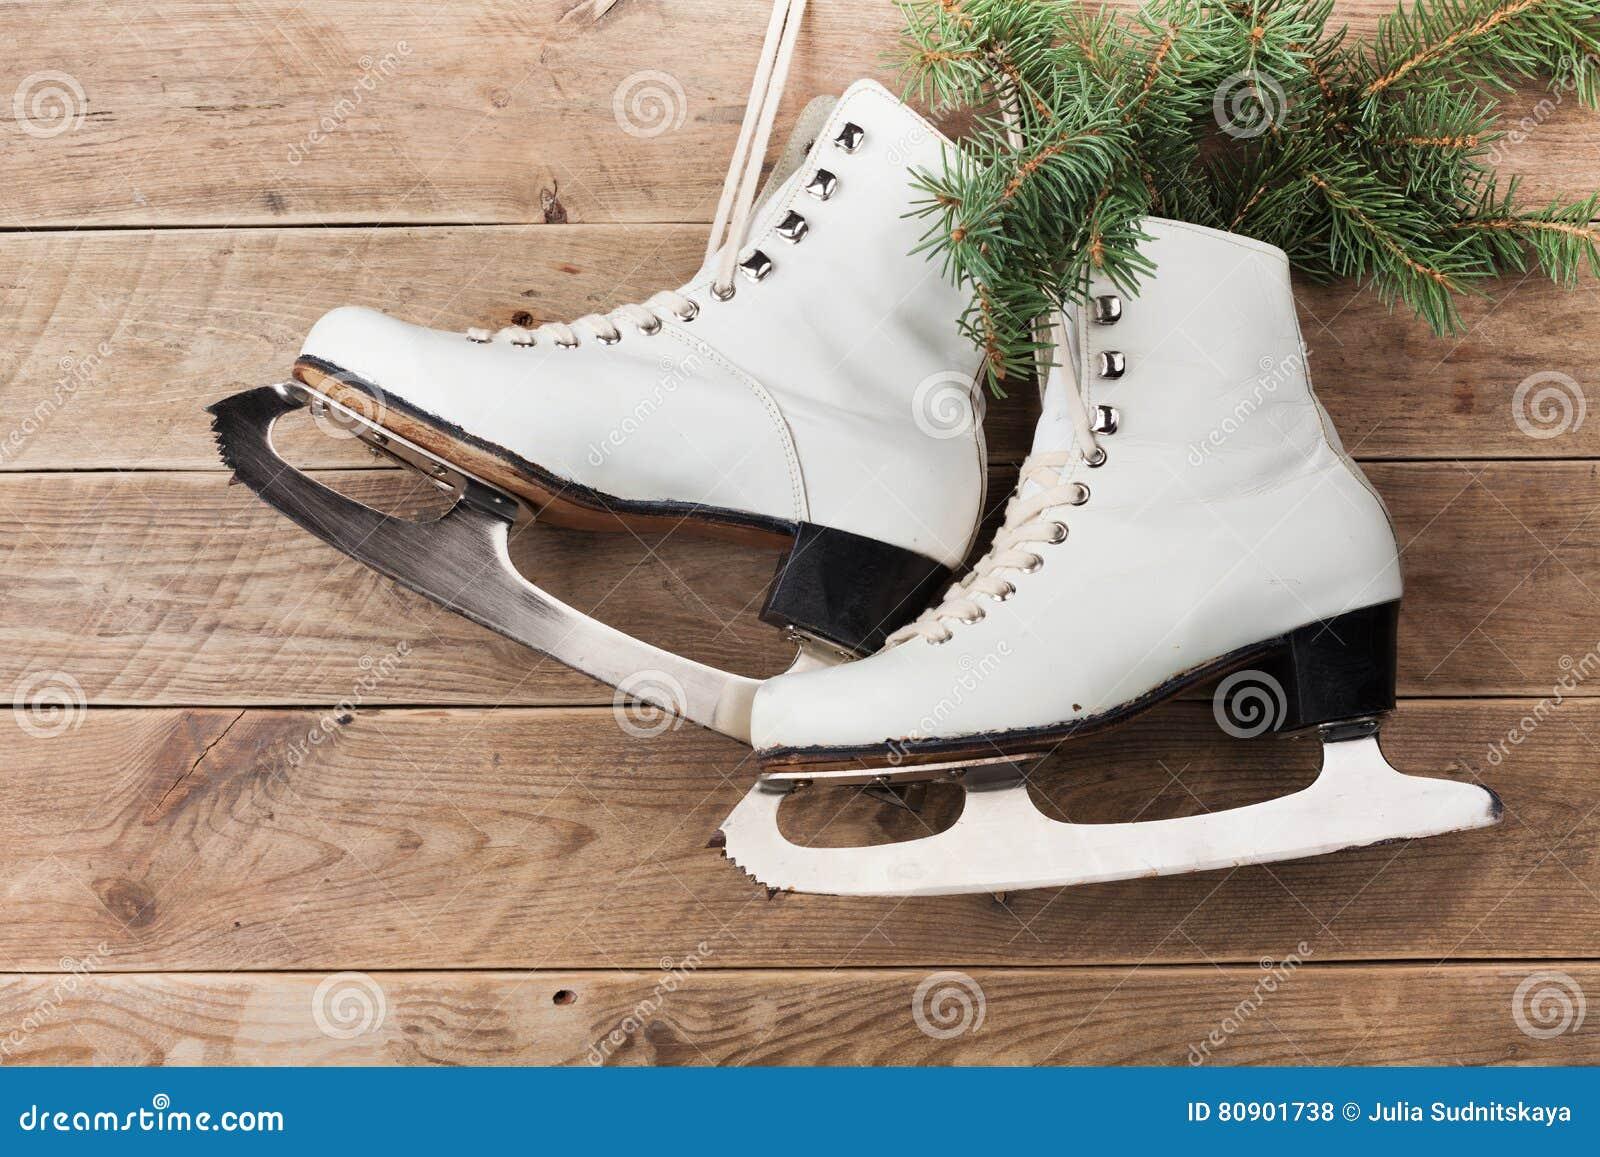 Roller skates for figure skating - Vintage Ice Skates For Figure Skating With Fir Tree Branch Hanging On Rustic Background Christmas